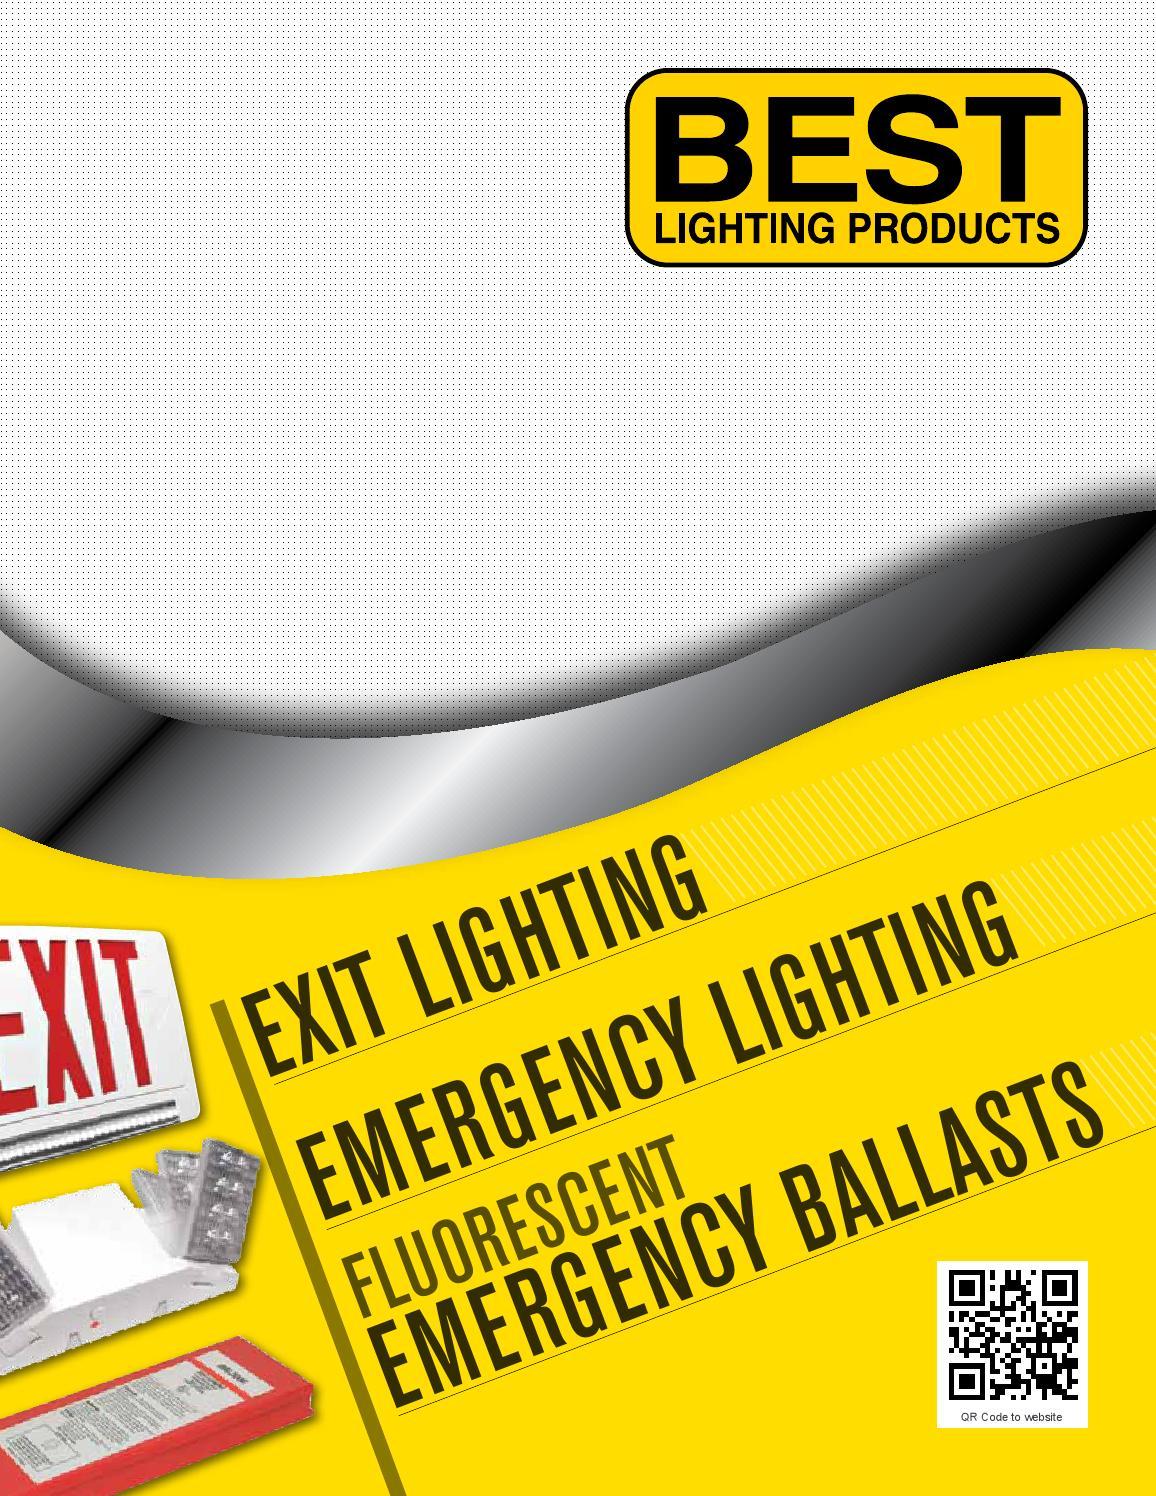 Best Lighting Catalog By Superior Issuu Bal3000 Em Ballast Wiring Diagram